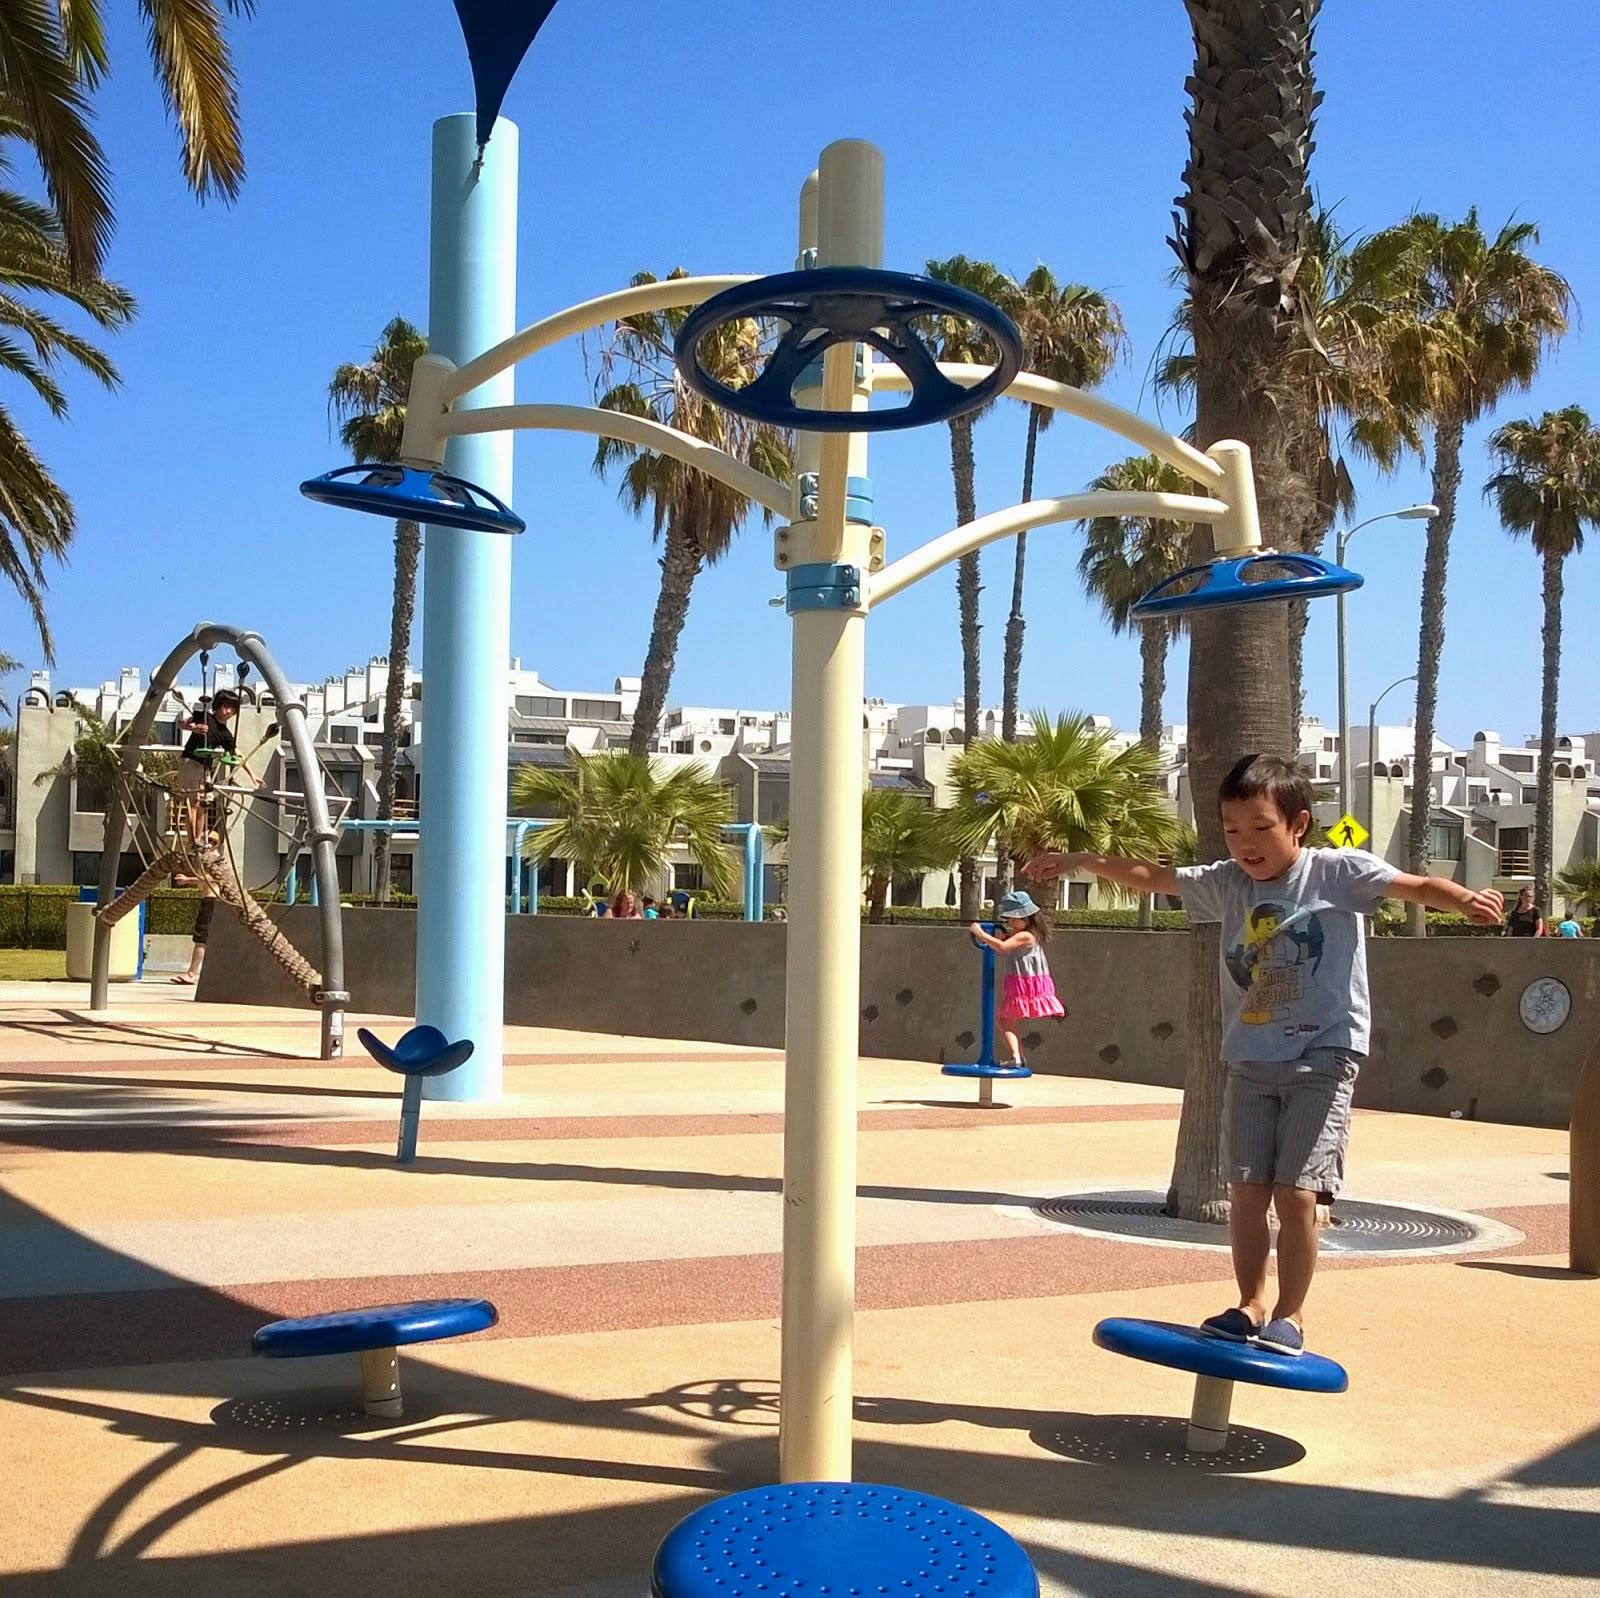 Santa Monica beach park